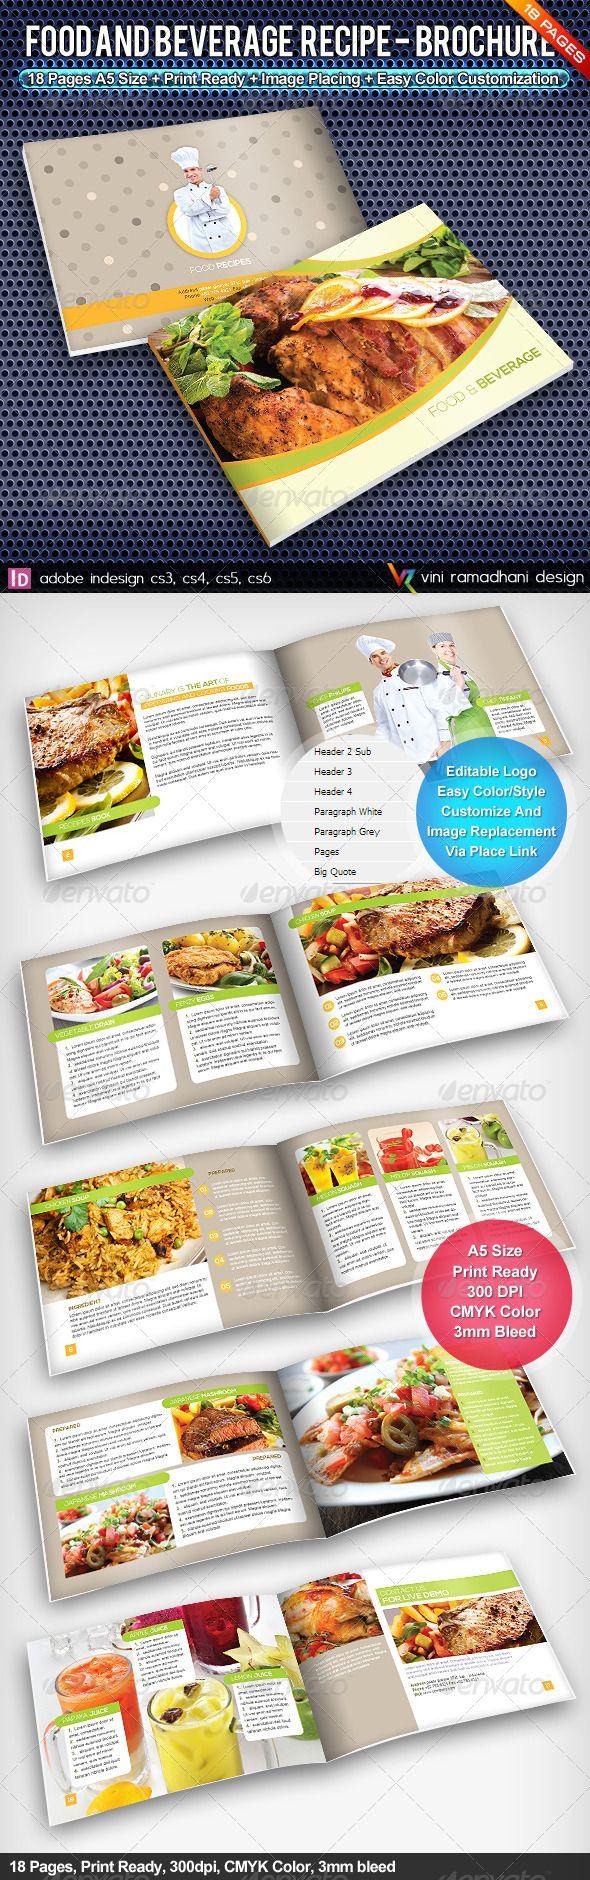 Color book in design - Food Recipe Brochure